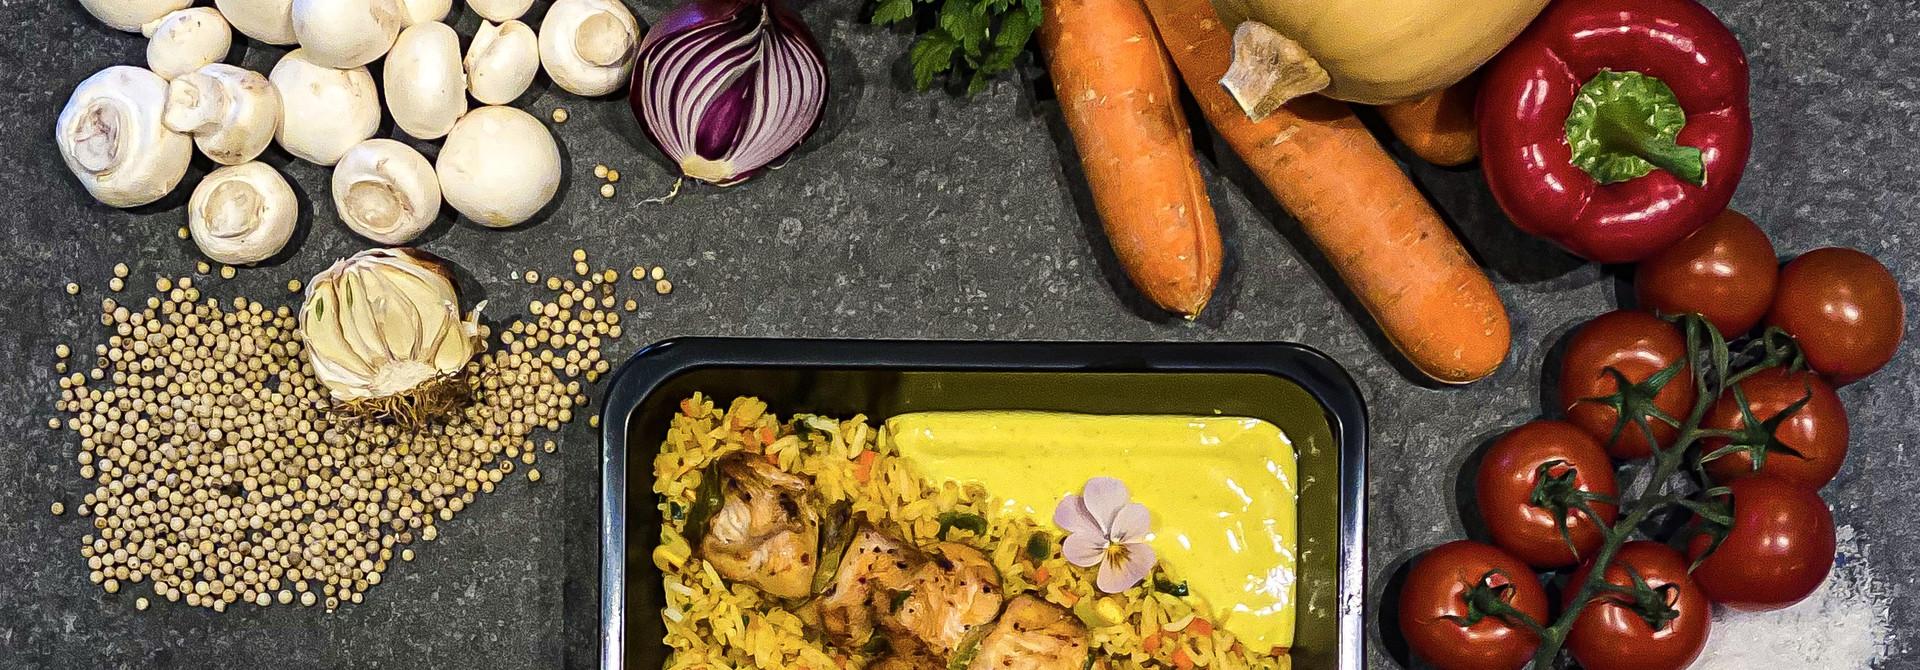 Kipsaté met rijst en currysaus